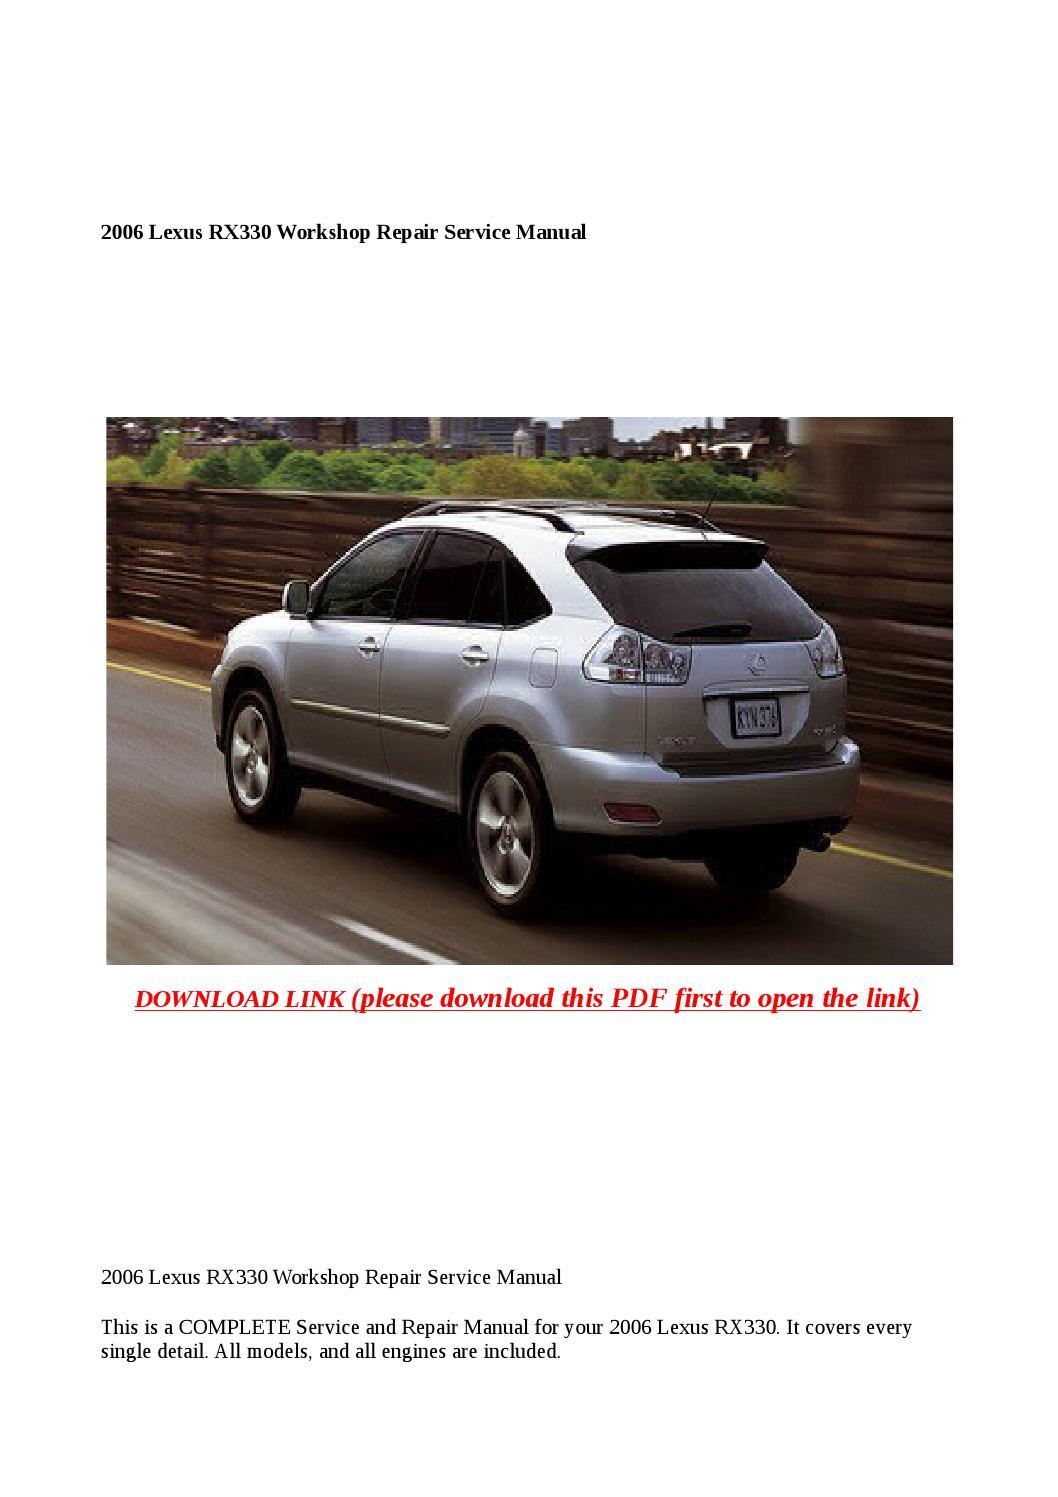 35a67221f9a lexus rx300 repair manual ebook